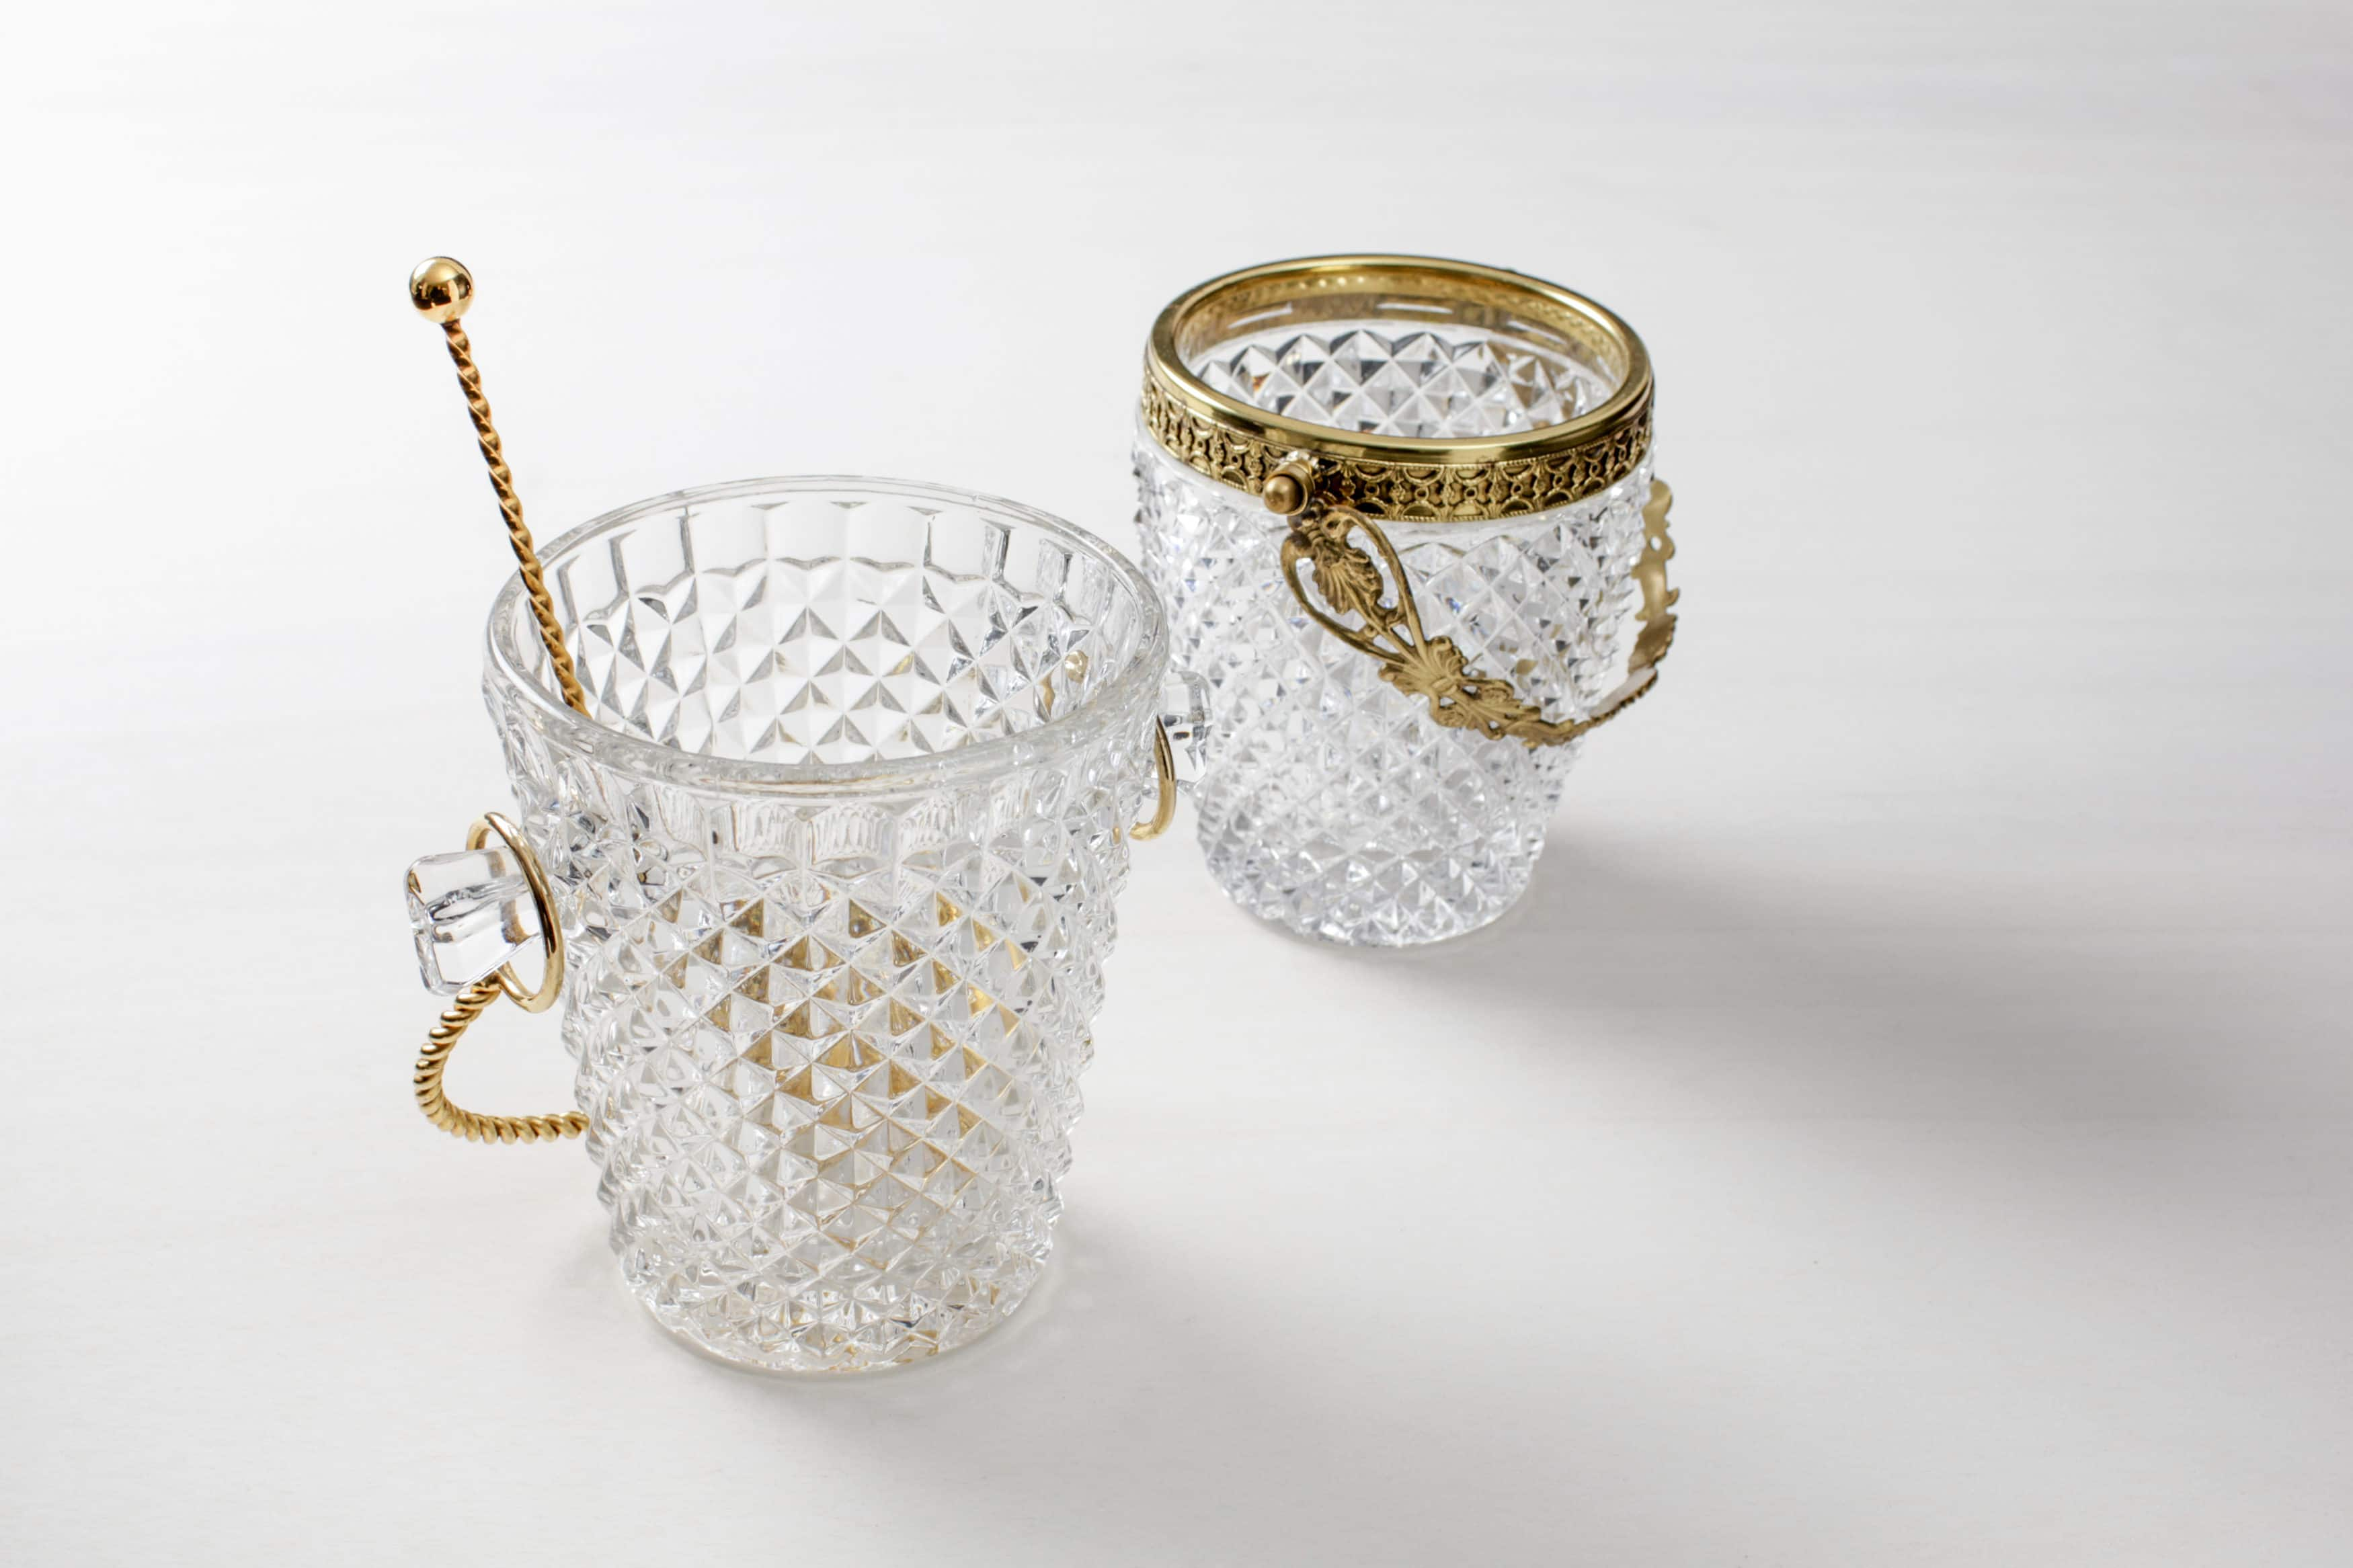 Vintage Eiswürfelbehälter aus Kristallglas mieten